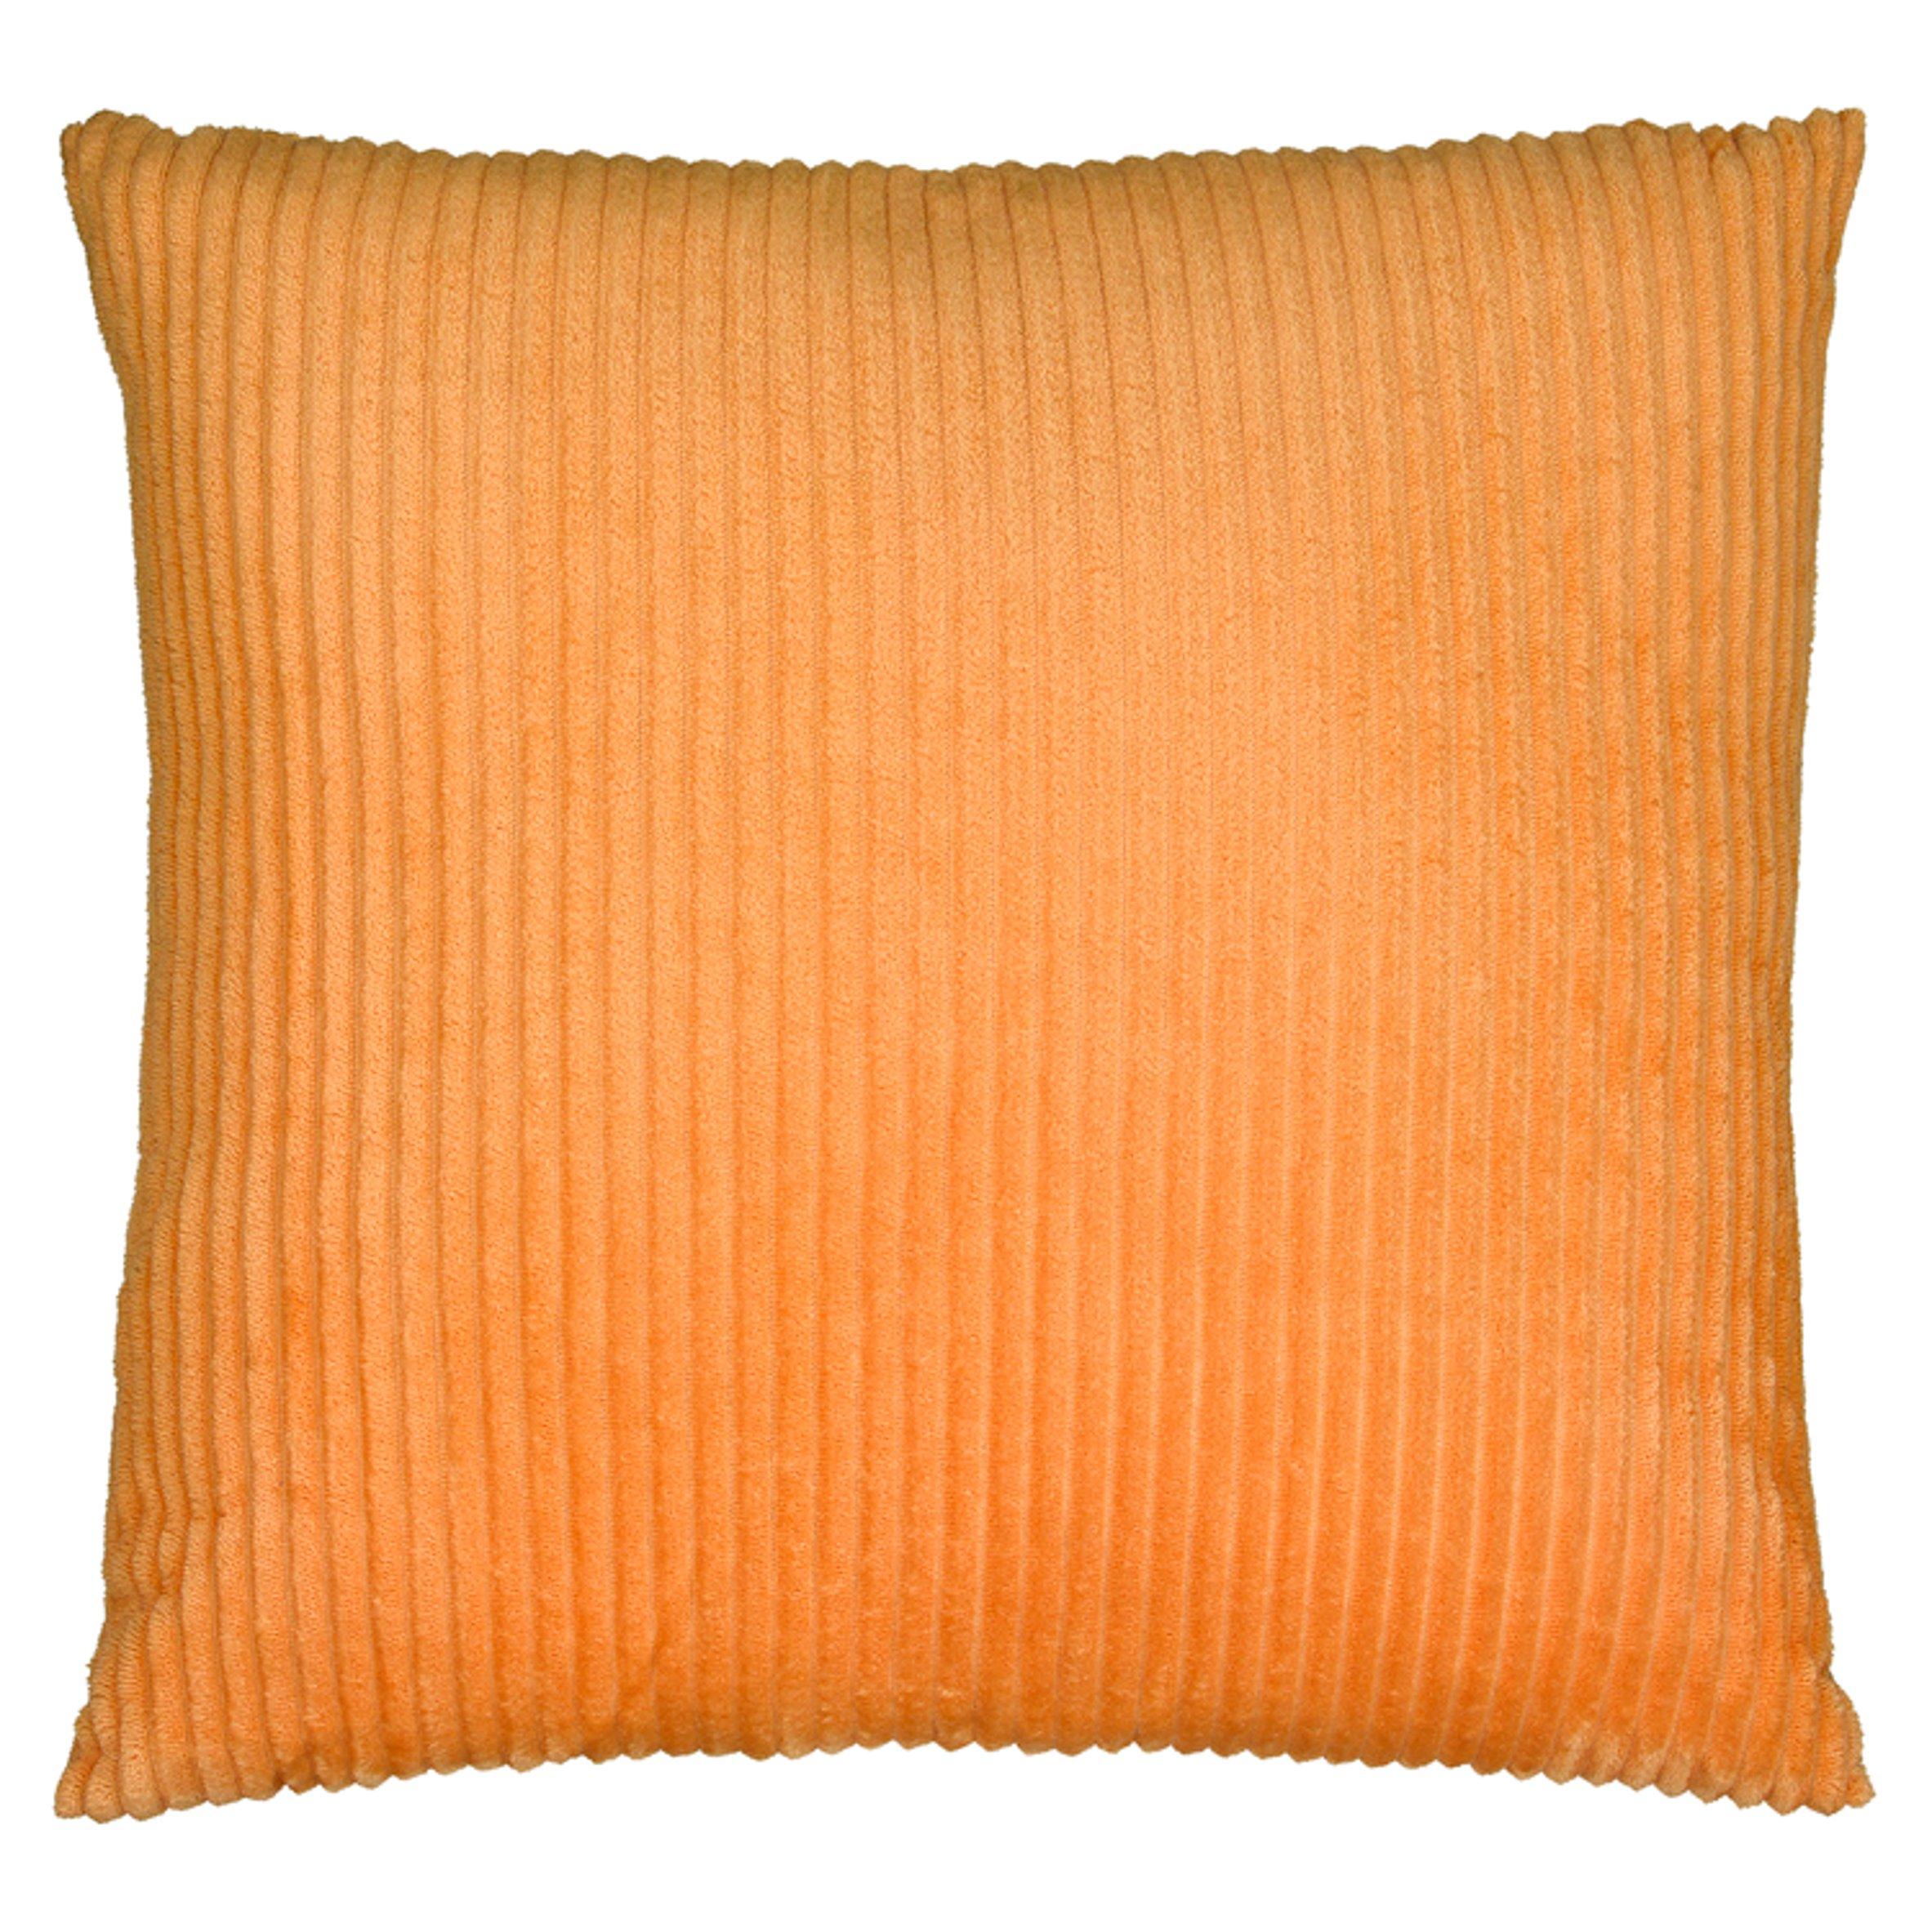 Tesco Jumbo Cord Cushion Ochre